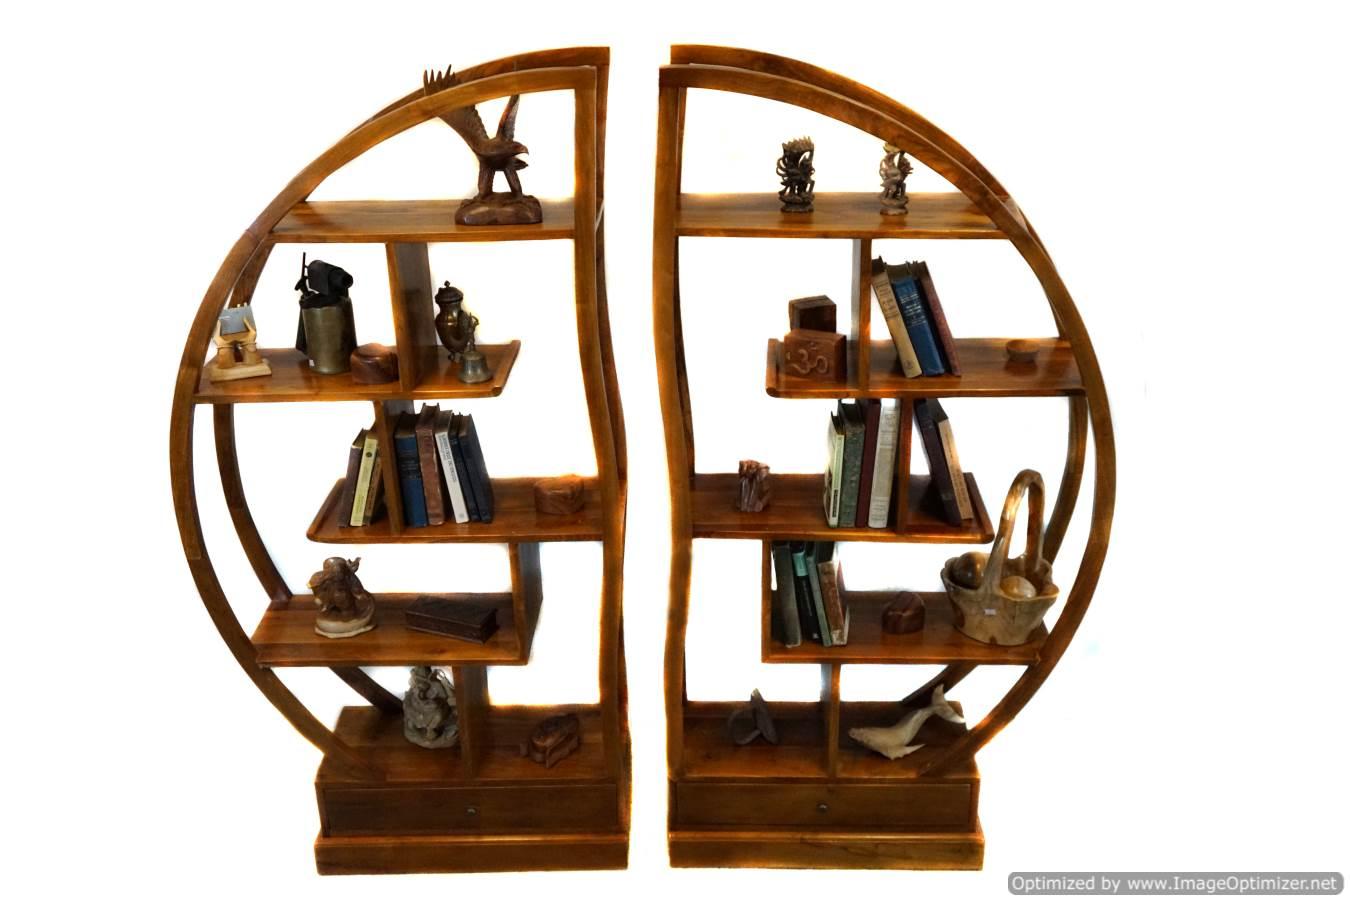 round-shelves